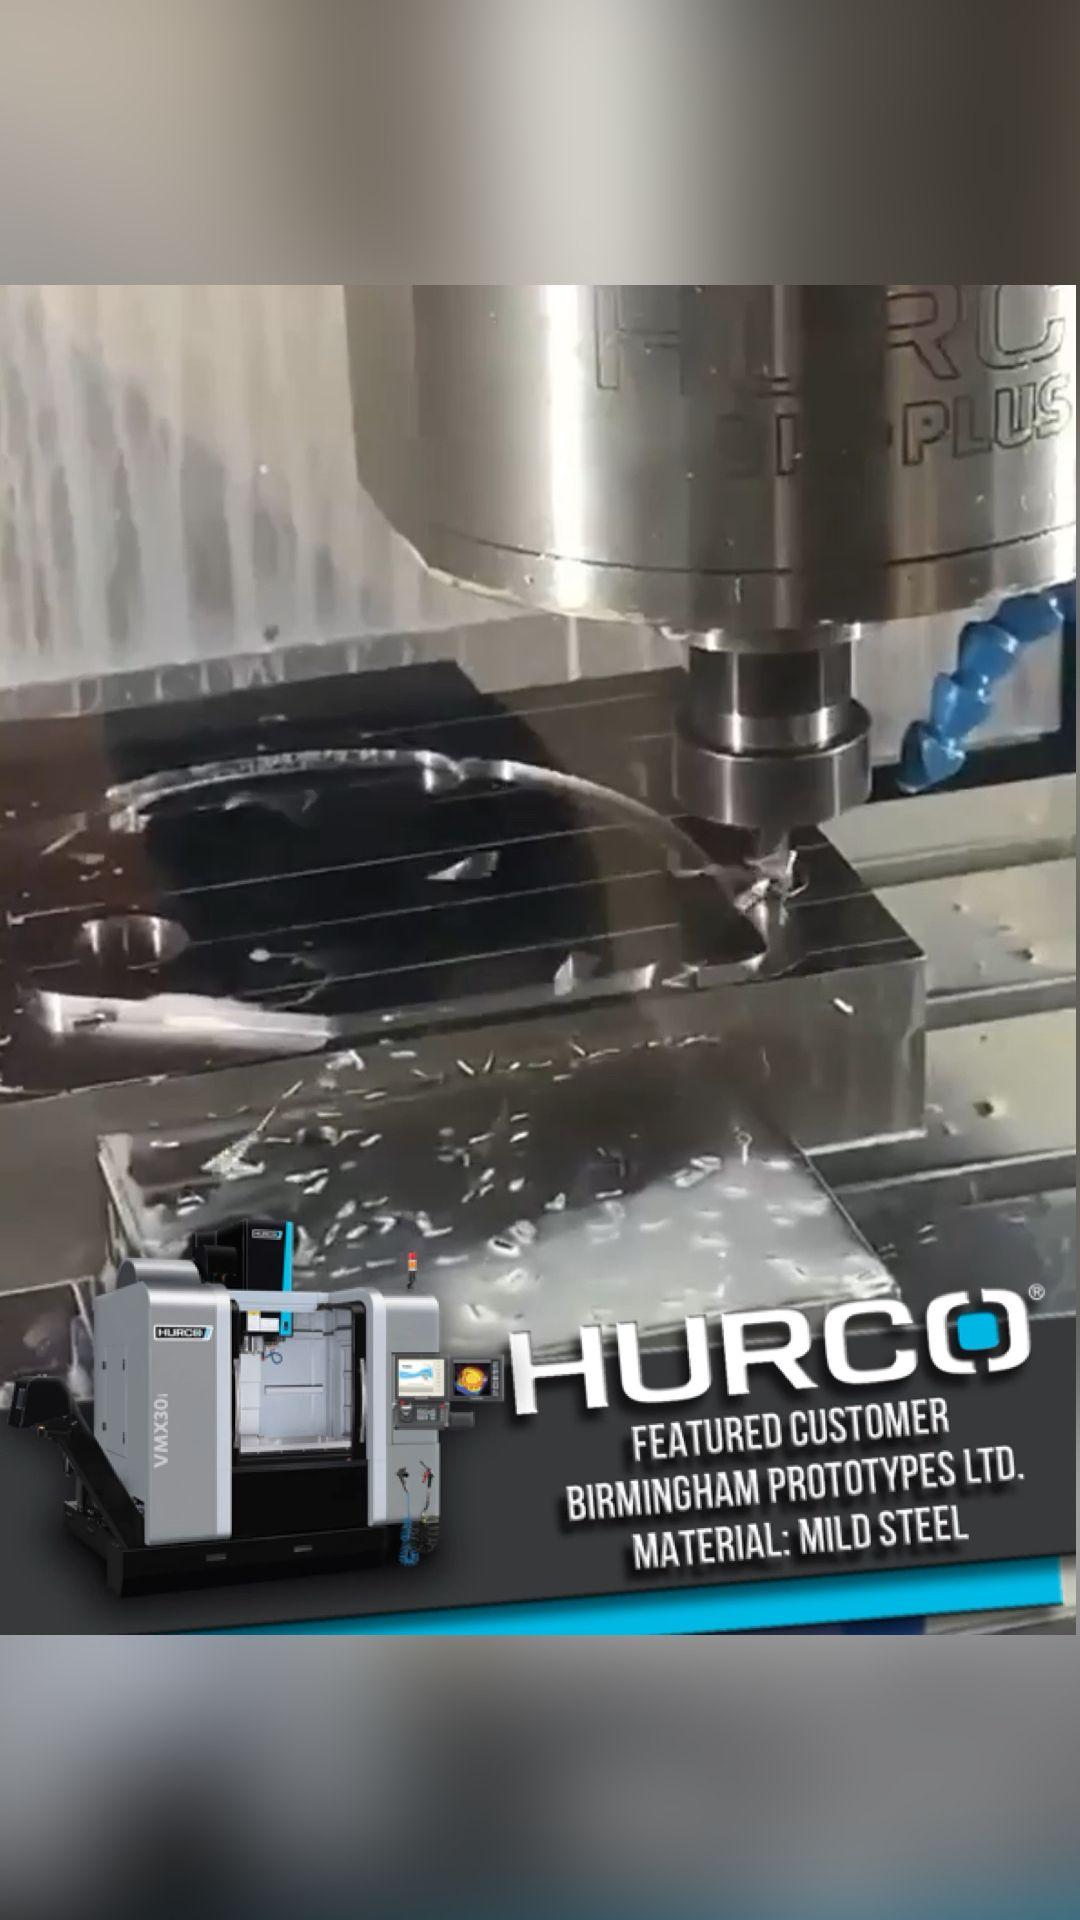 Hurco VMX30i CNC Machine